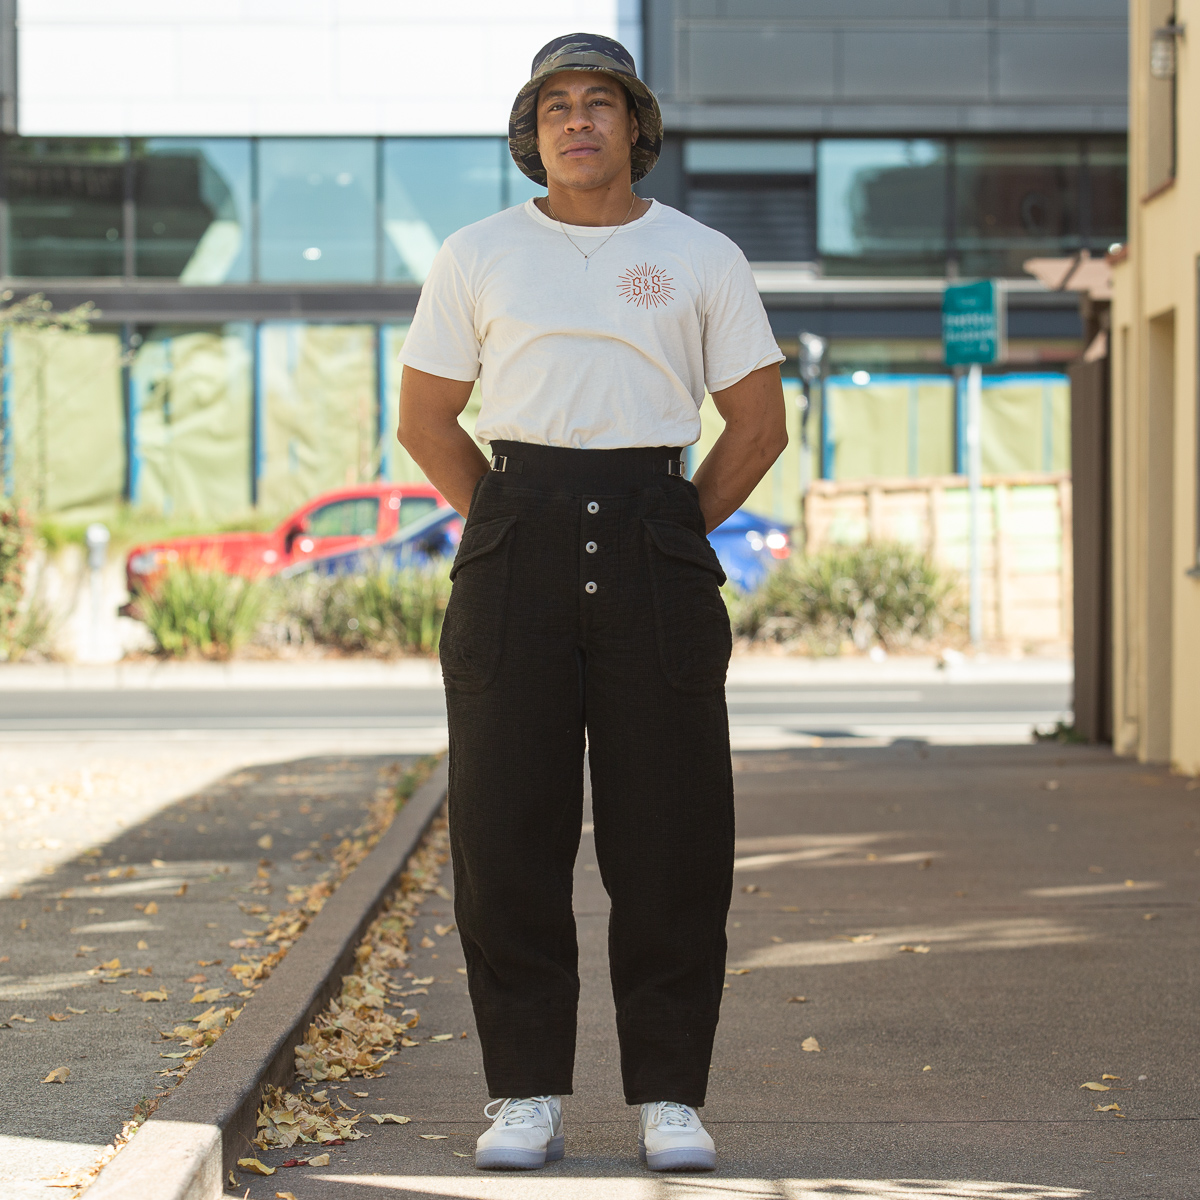 1p - British Military Sweatpants - Black Waffle Double Cloth-Onbody-5760 x 3840-30.jpg